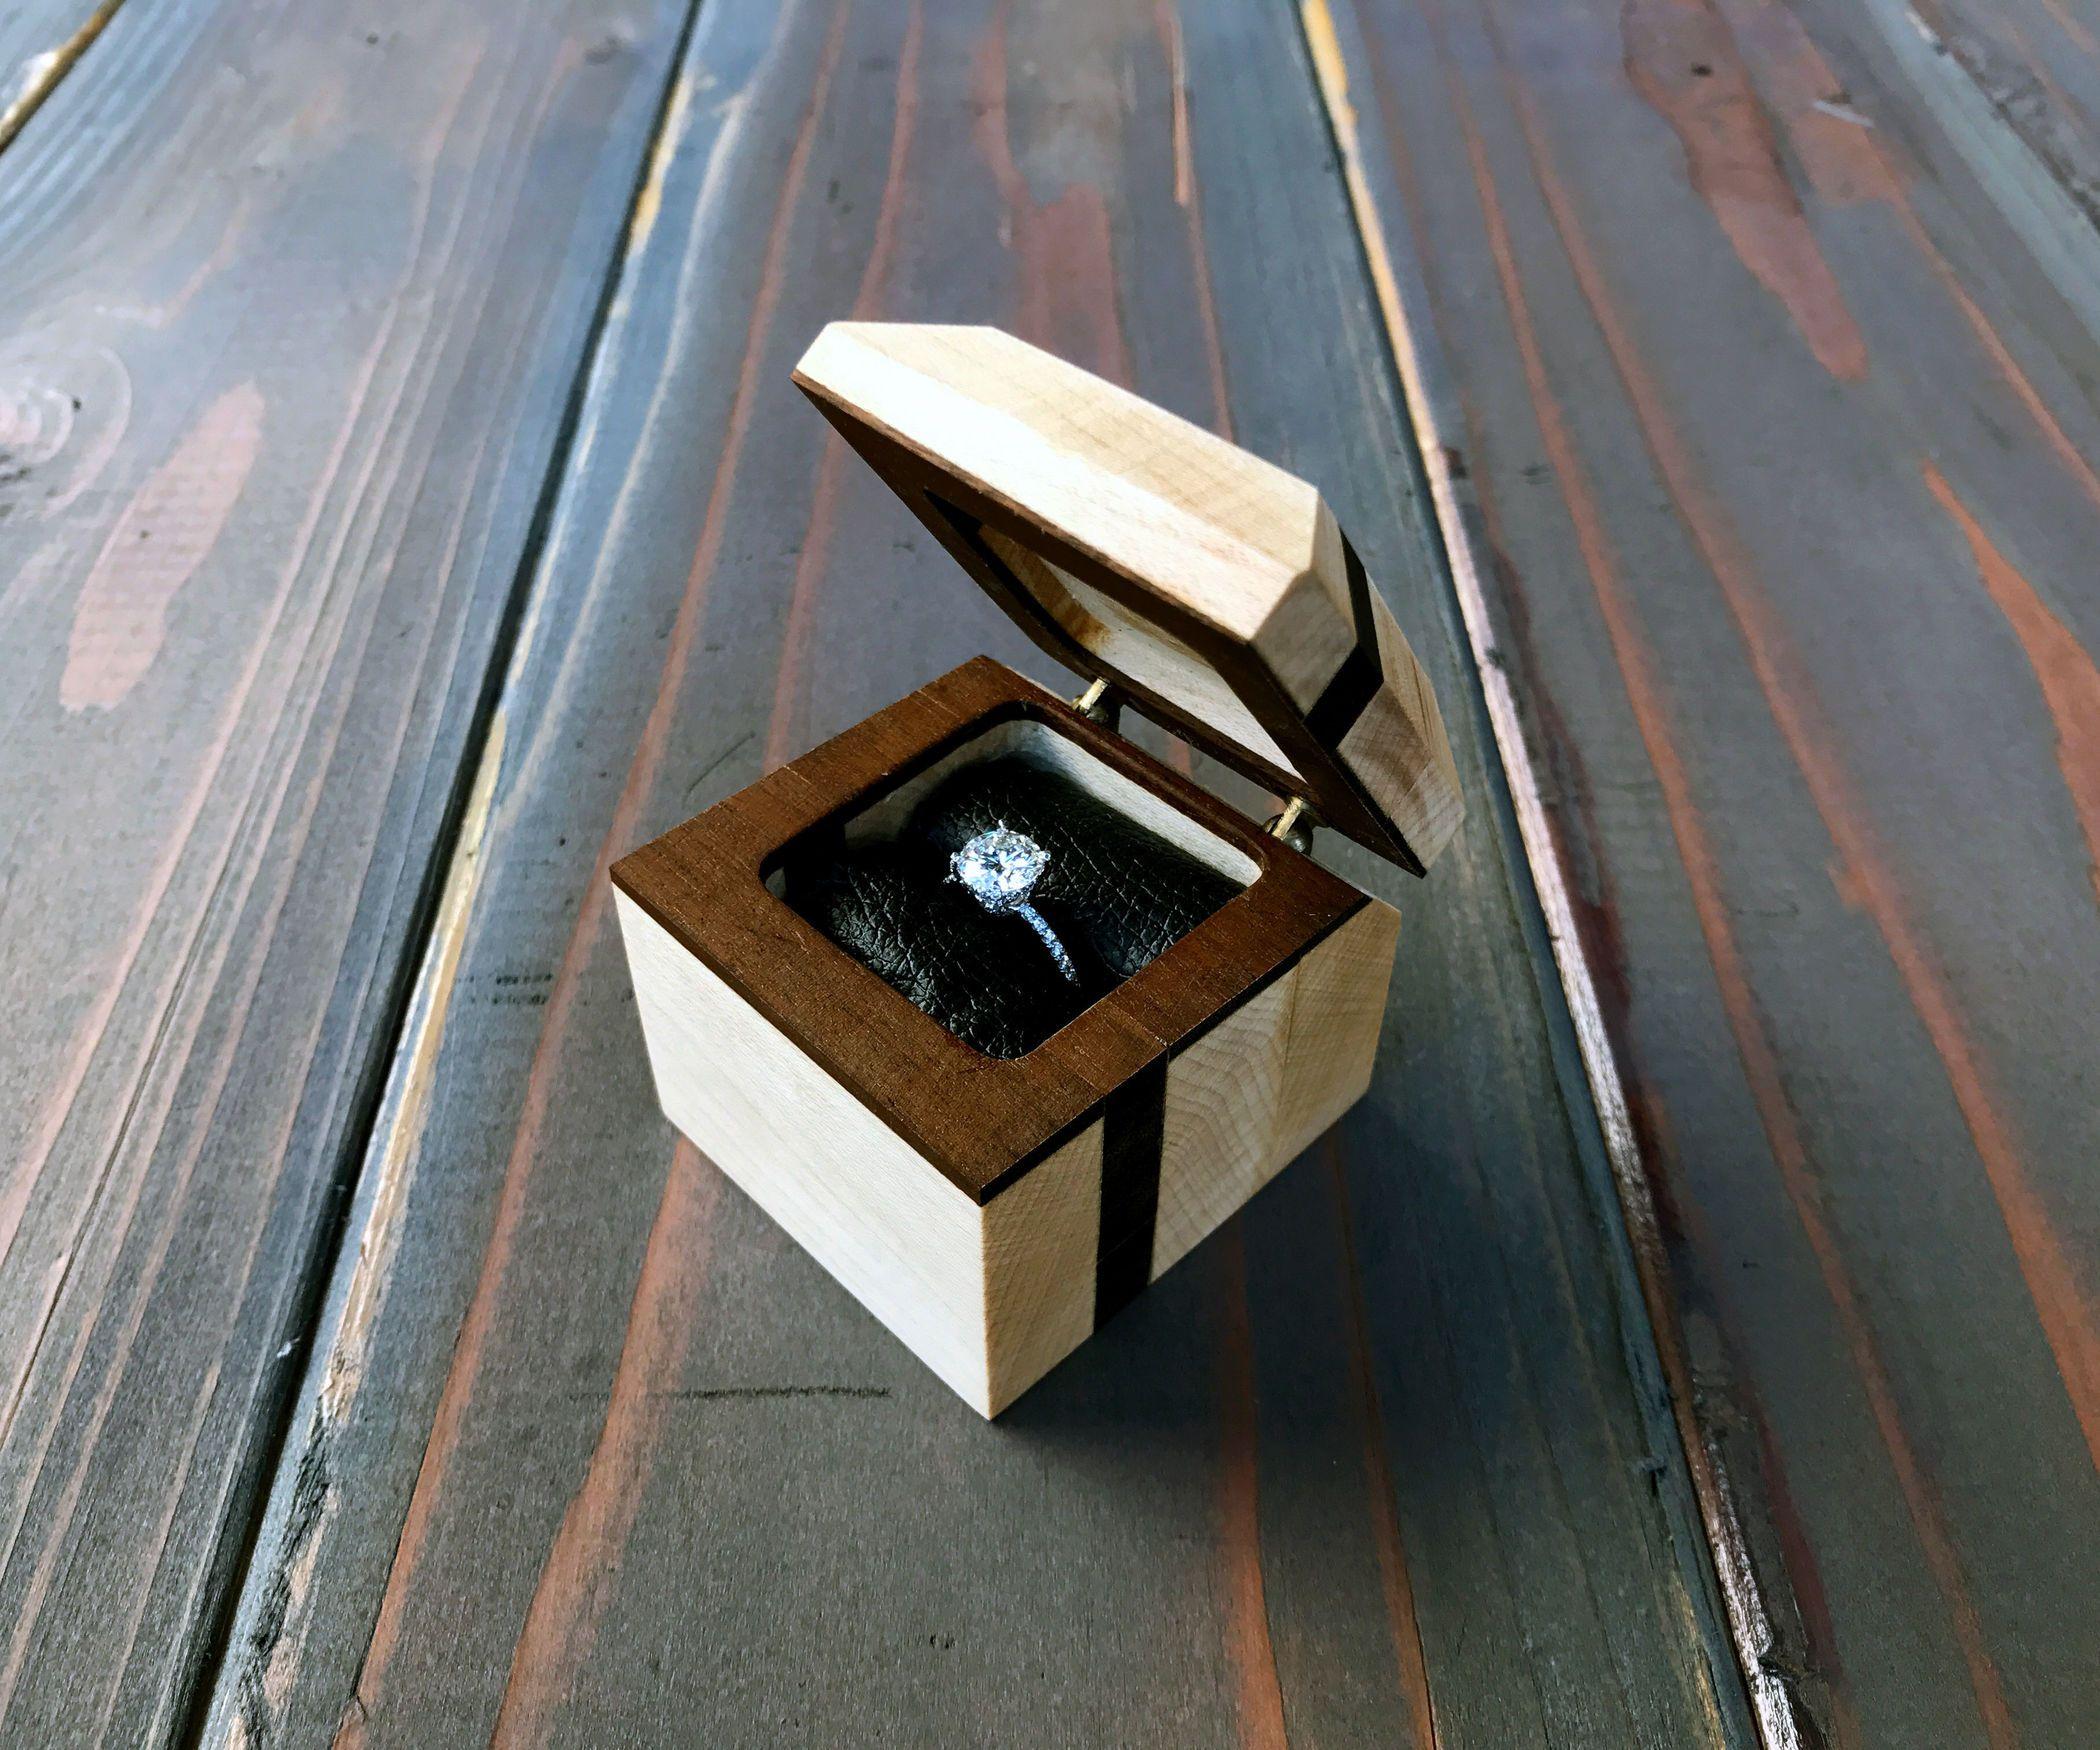 Wallpaper diy wedding ring box of door hanger smartphone high resolution engagement and woodworking